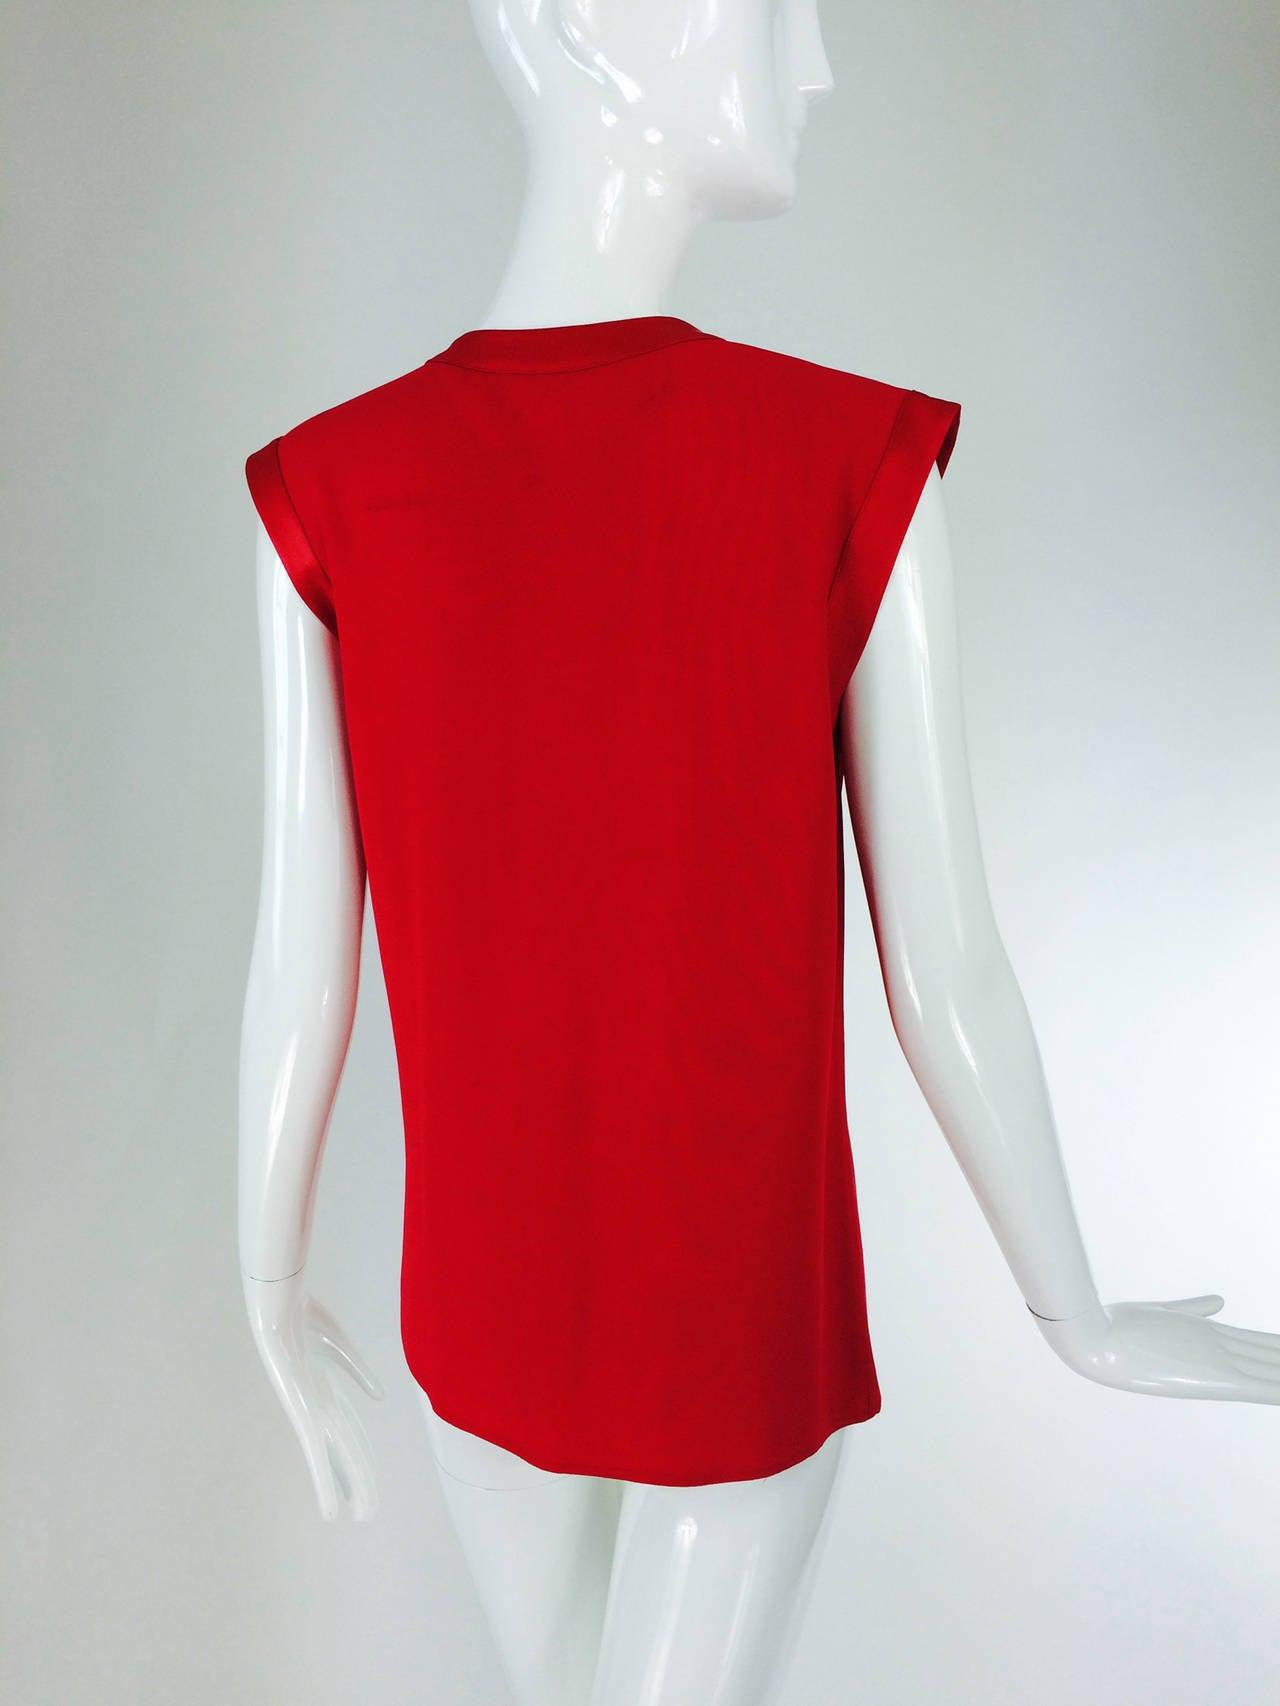 Yves St Laurent YSL Rive Gauche red satin back crepe sleeveless top 4